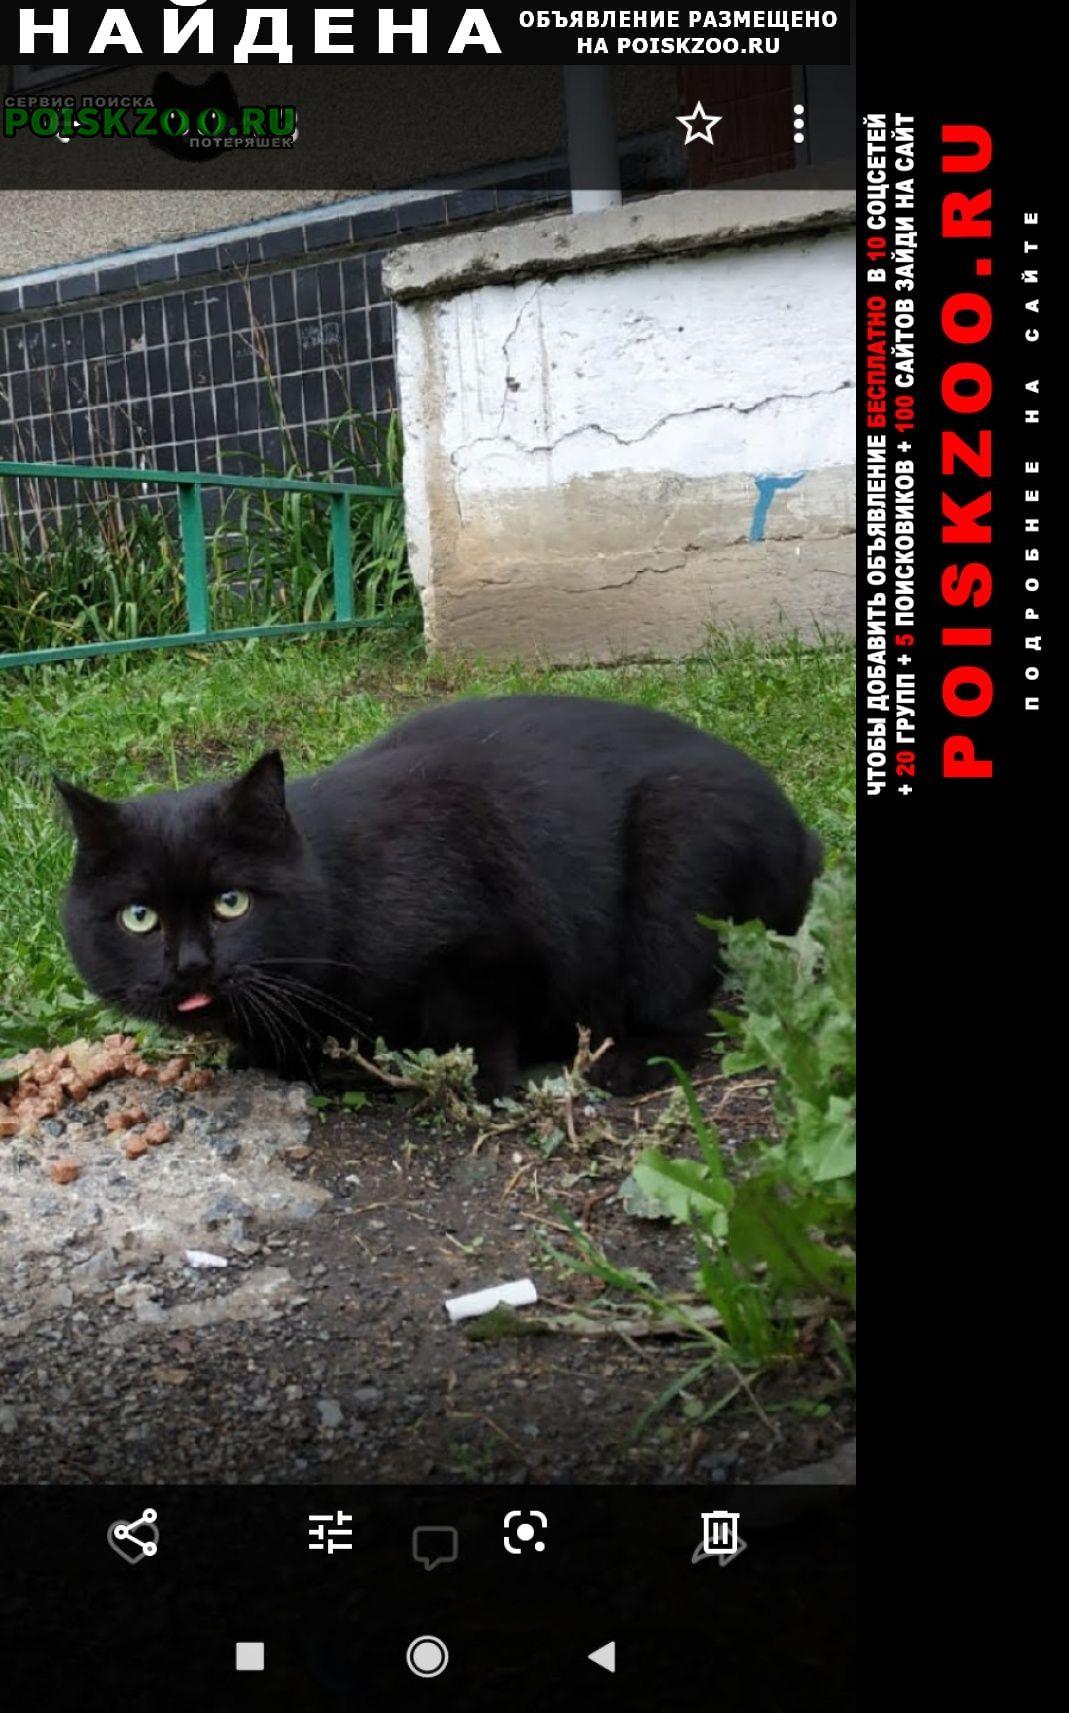 Найдена кошка северо-запад.август.район 36 школы Челябинск